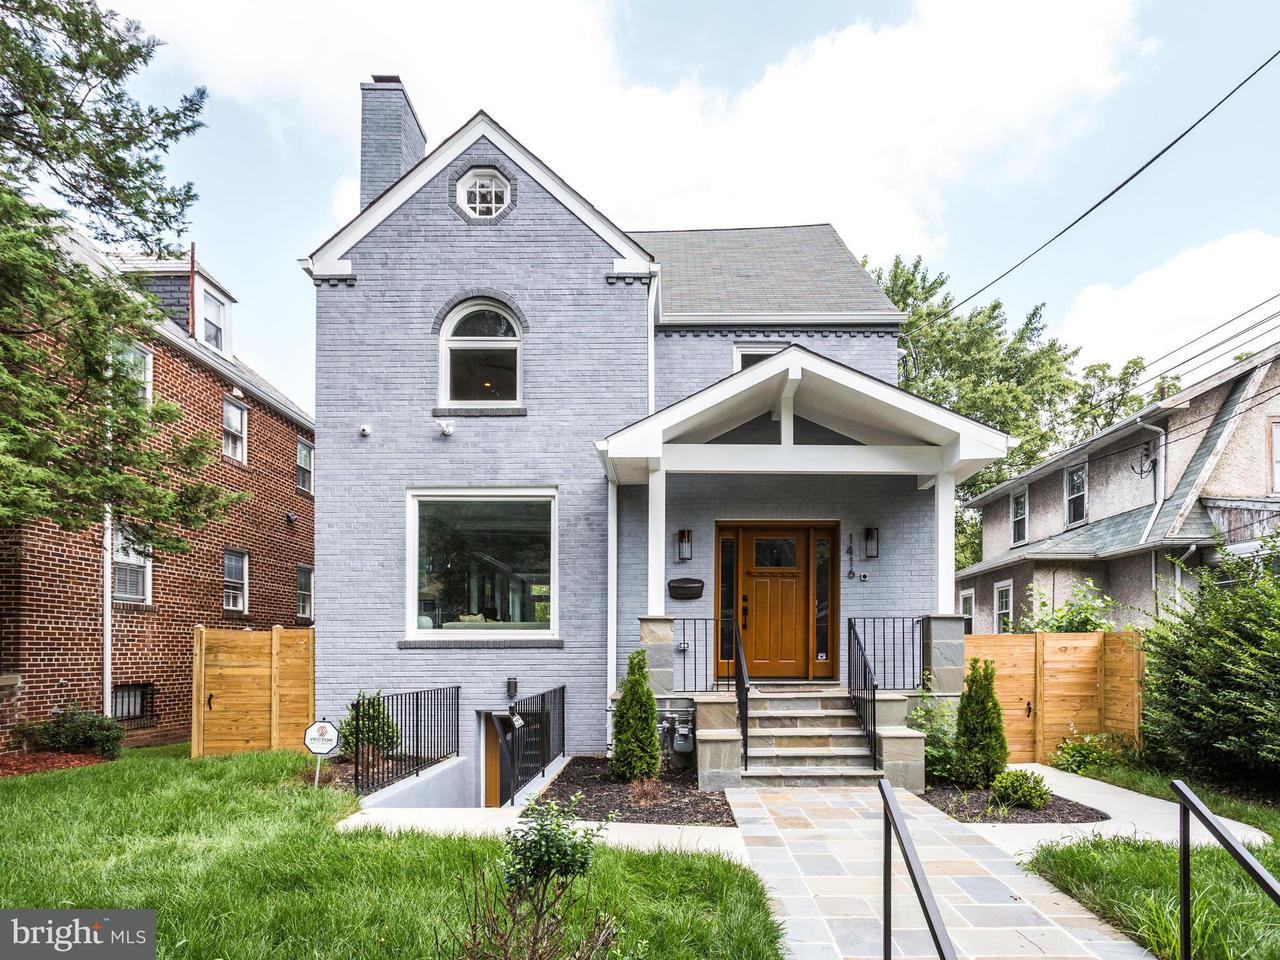 Single Family Home for Sale at 1416 Otis St Ne 1416 Otis St Ne Washington, District Of Columbia 20017 United States